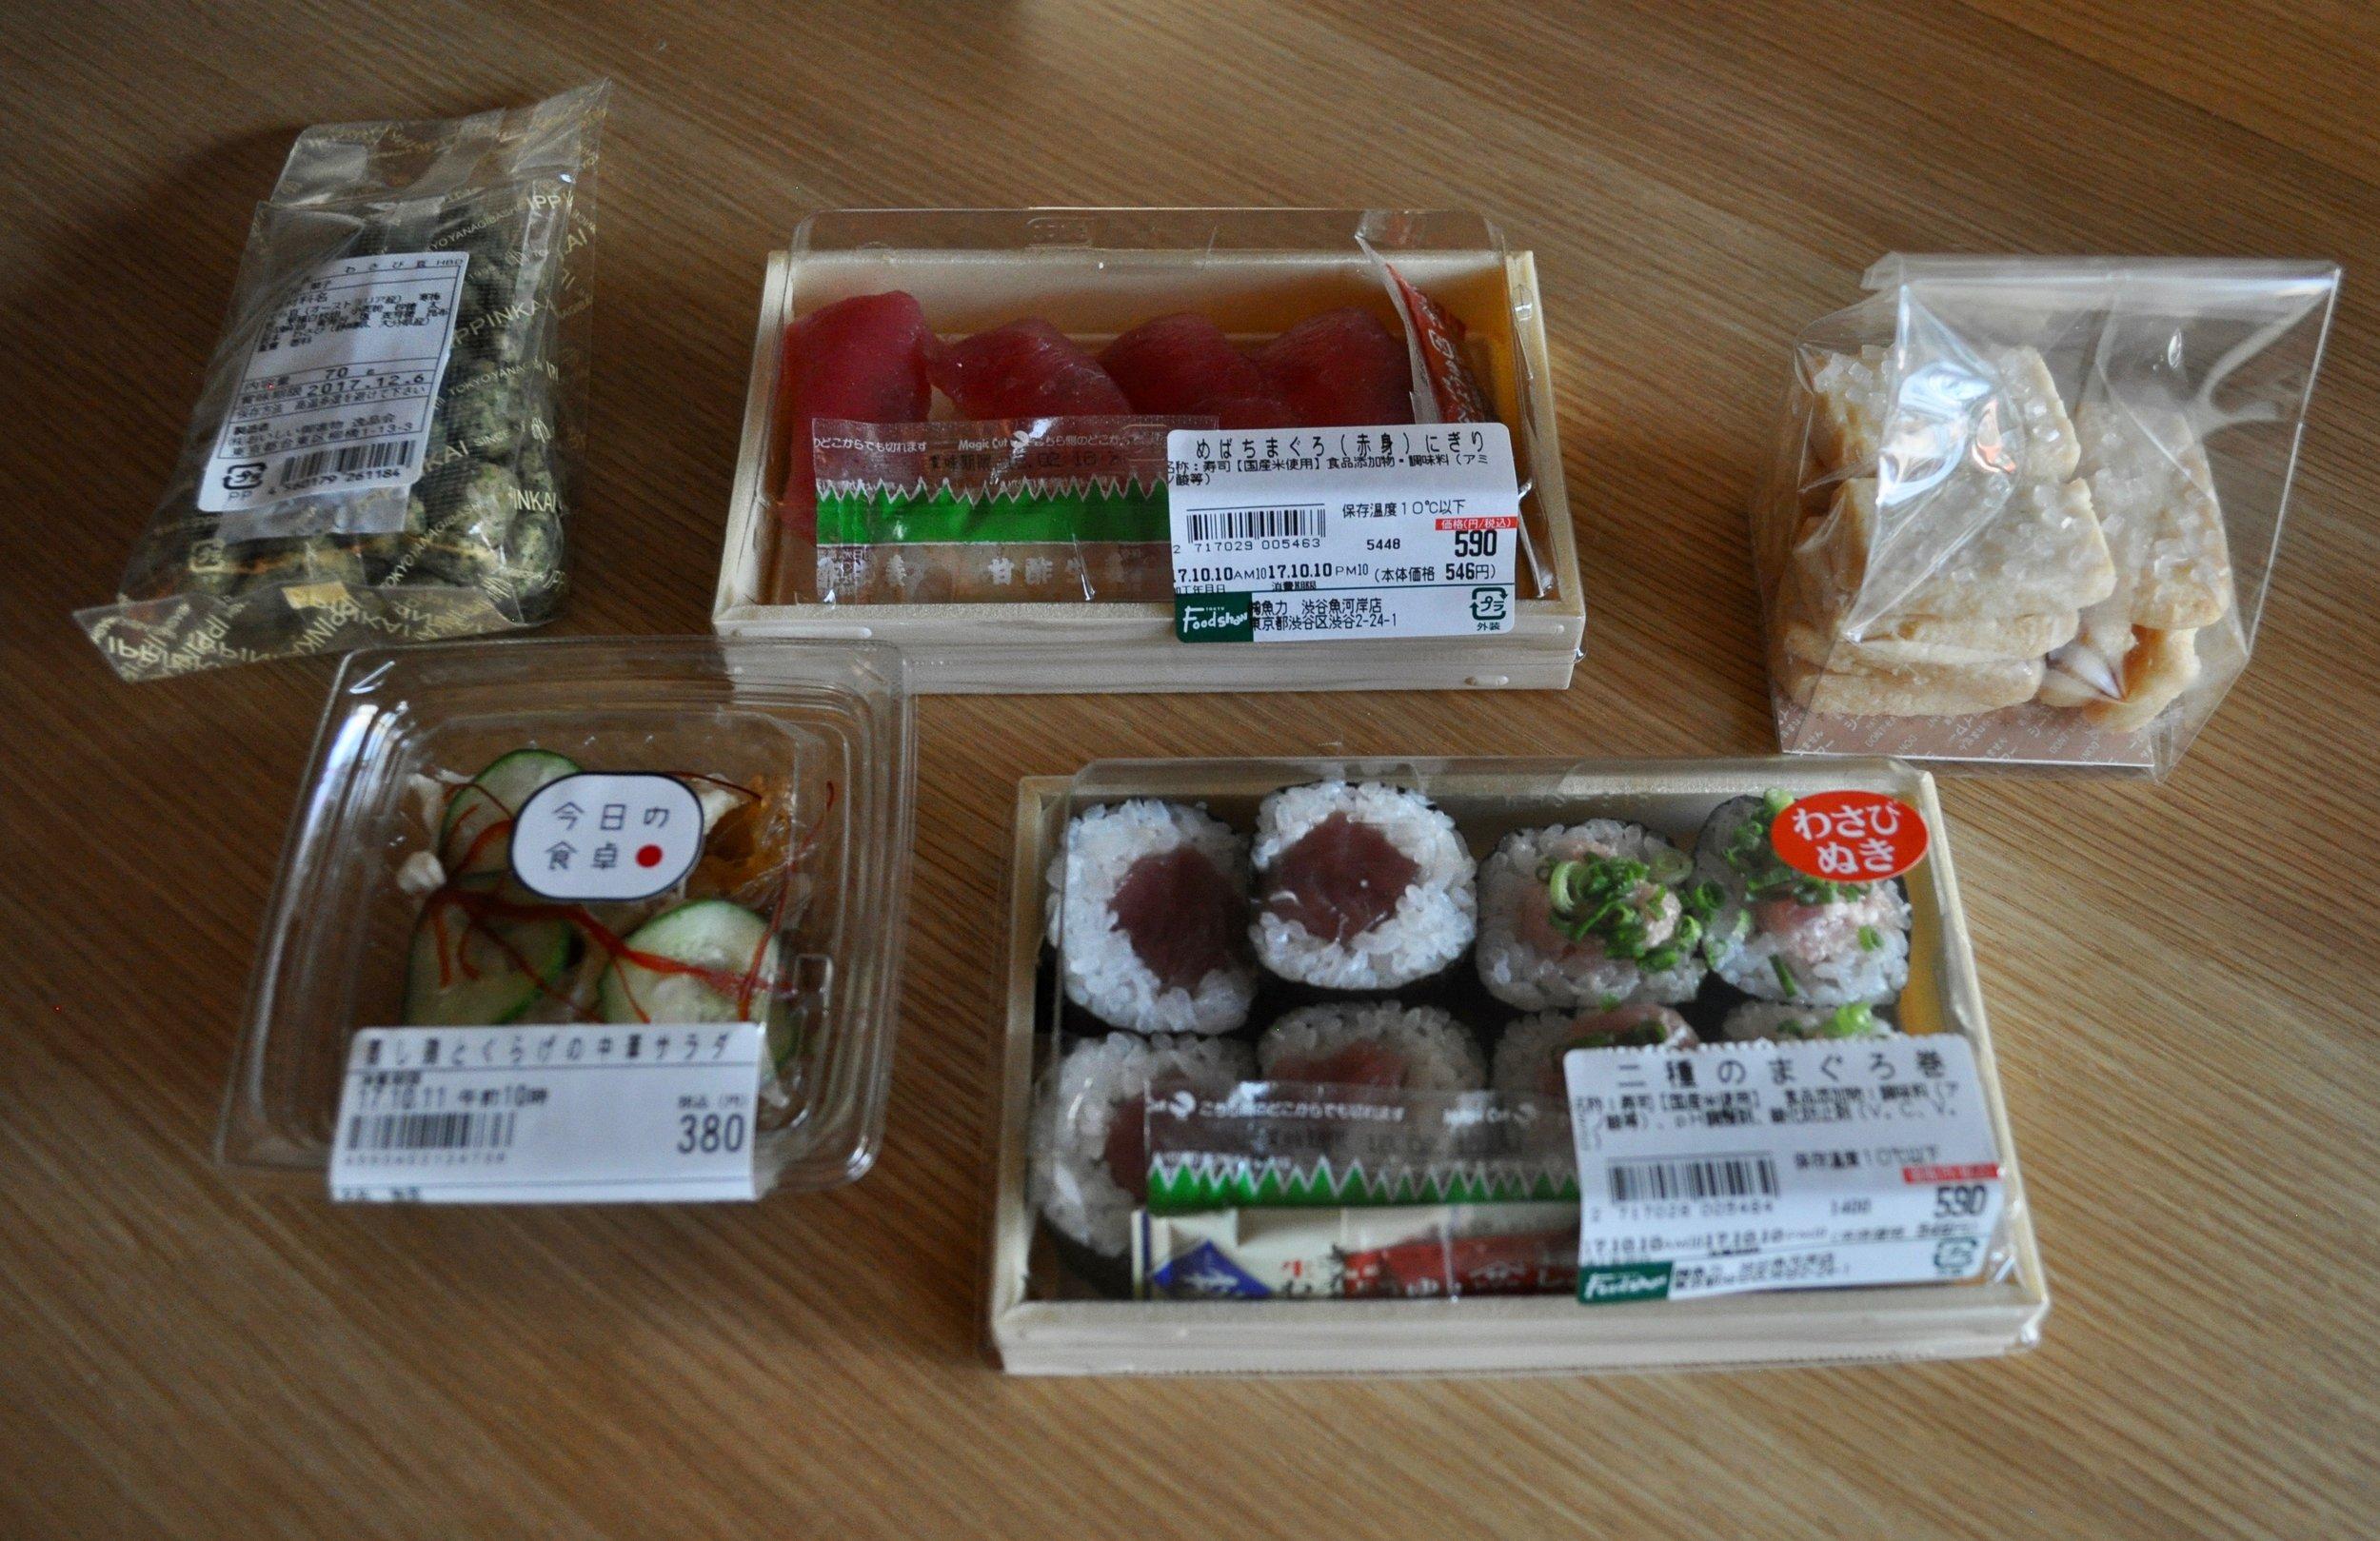 Tokyo Food Show finds